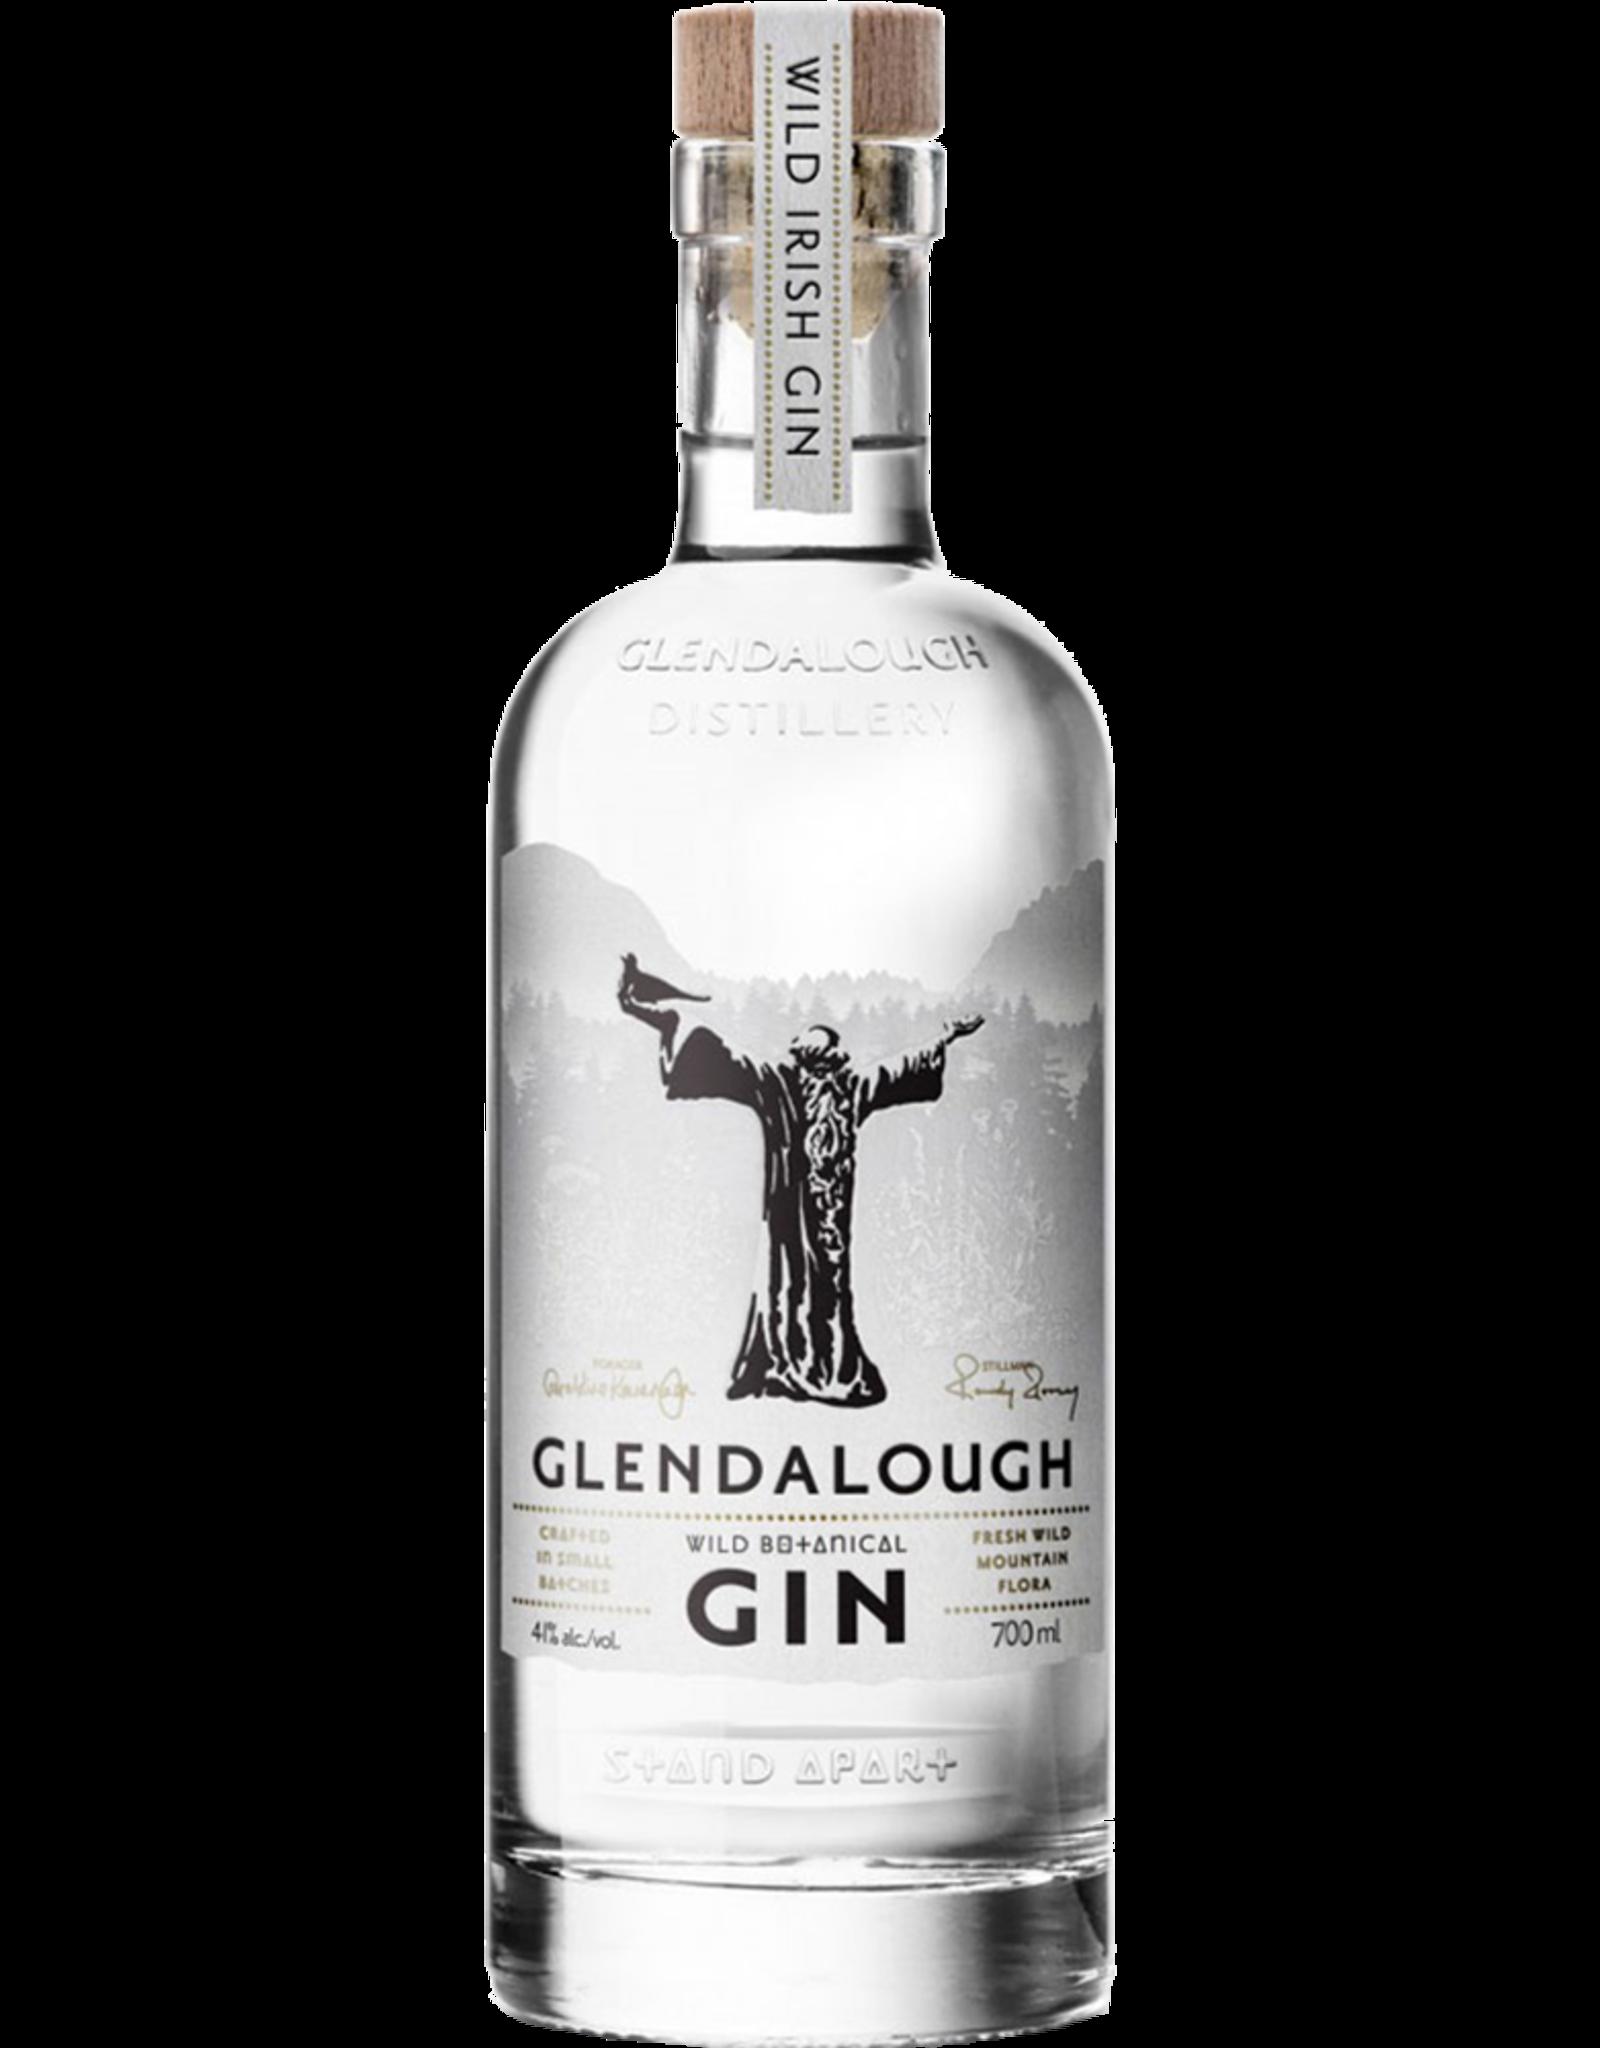 Glendalough Wild Botanical Gin